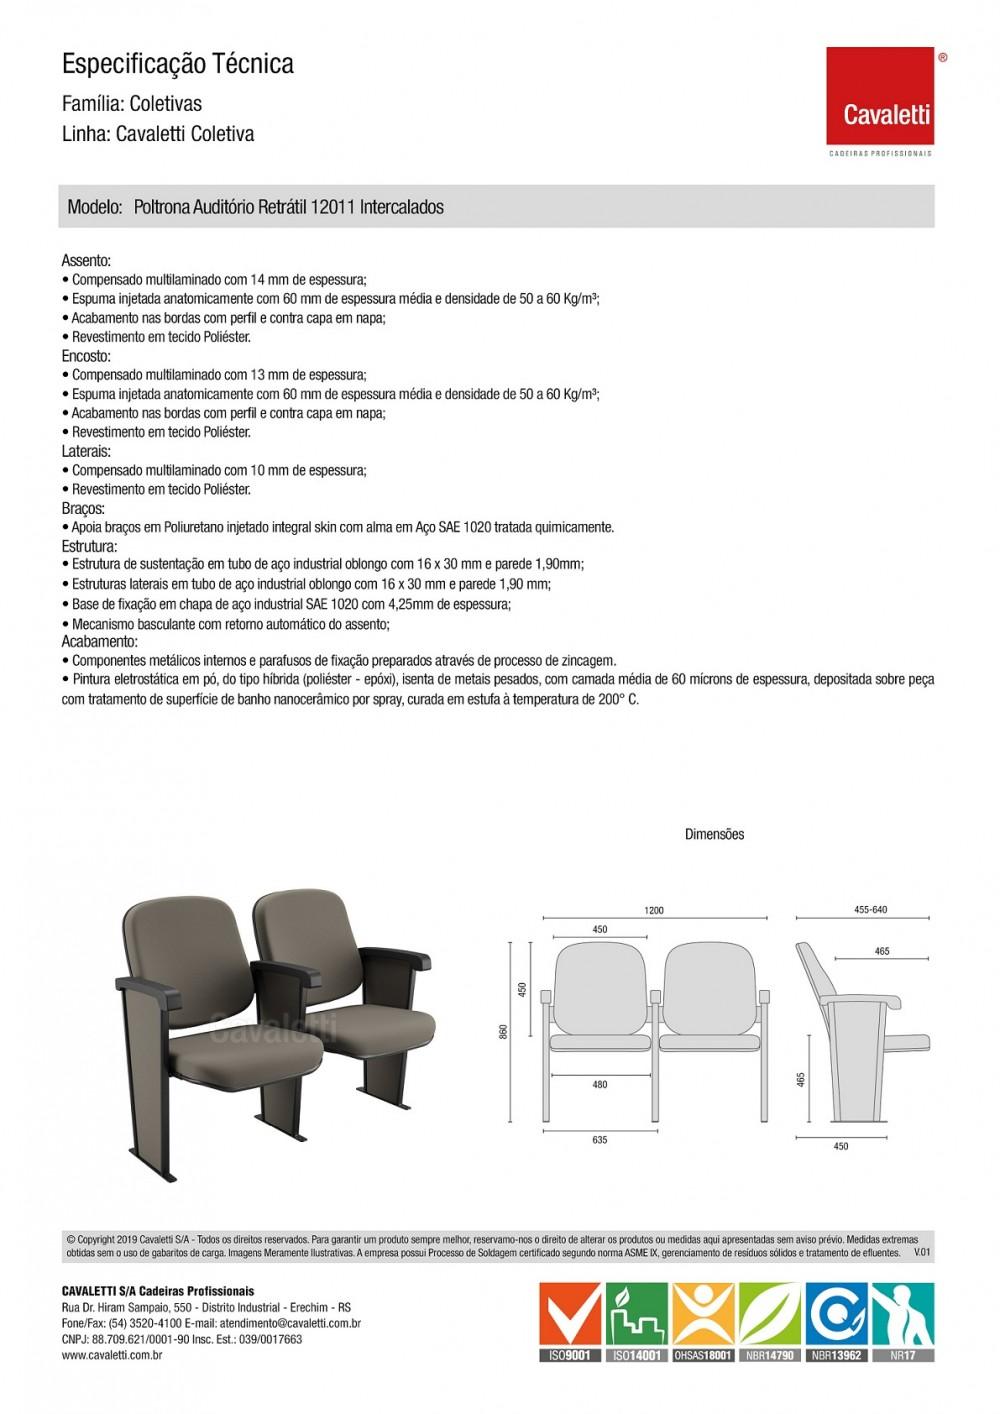 Poltrona Auditório 12011 Retrátil - Braço Intercalado - Sem prancheta -  Linha Coletiva - Cavaletti -